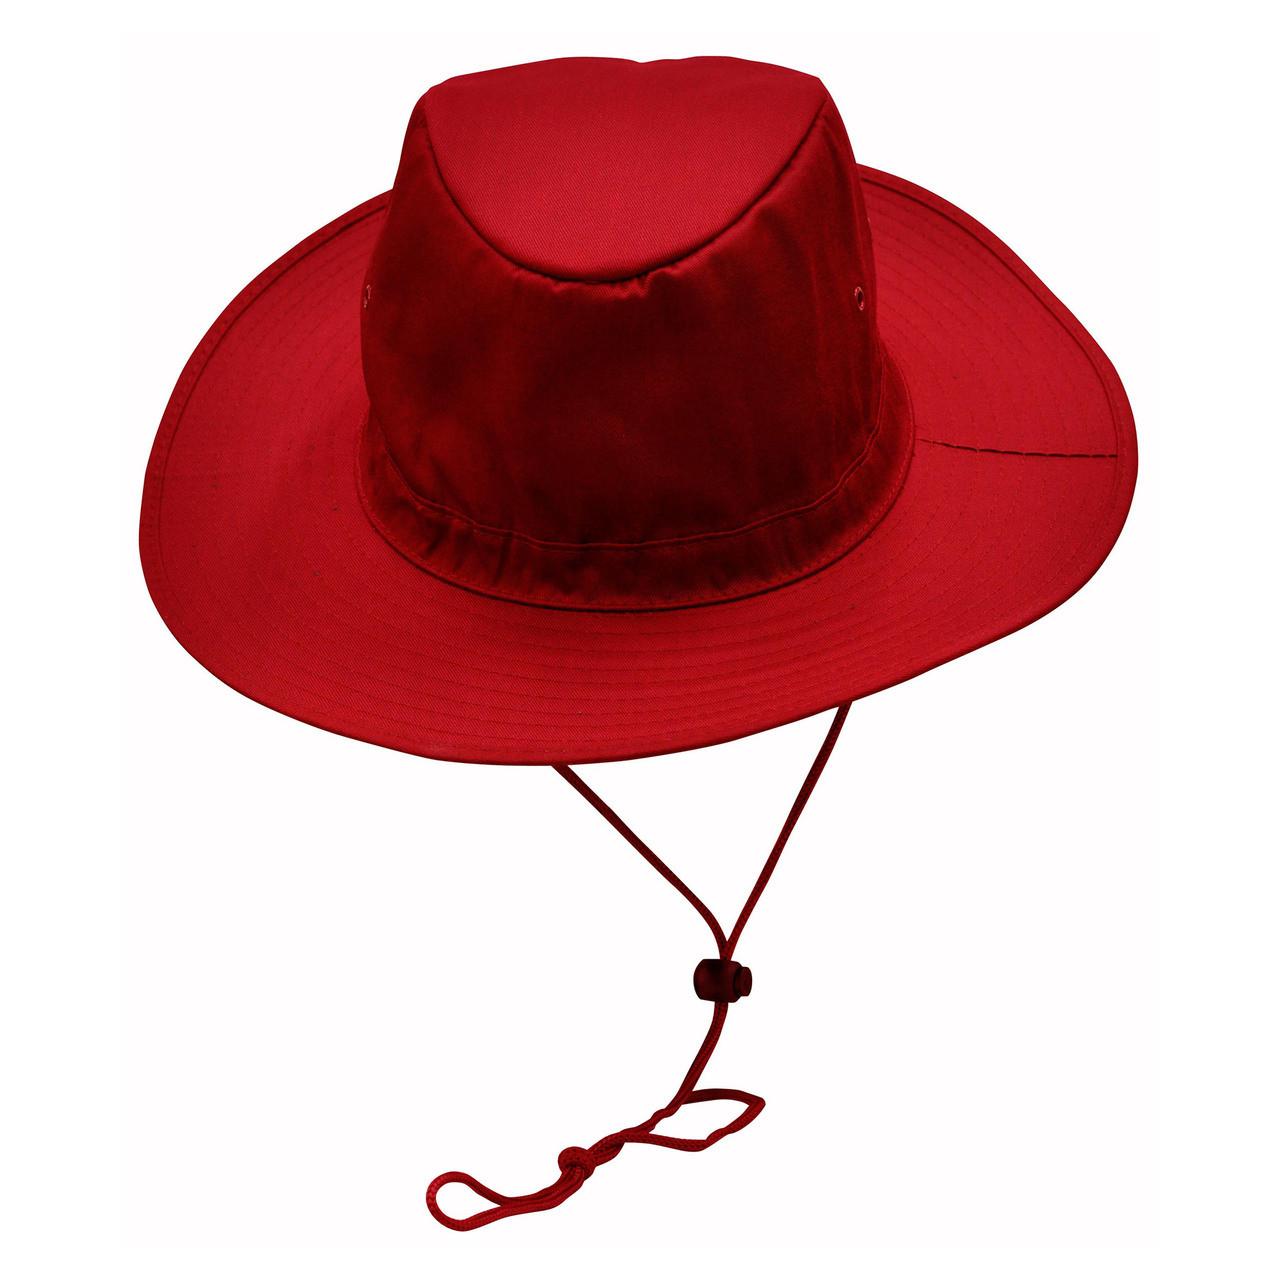 5932da6deb5315 SLOUCH HATS | wide brim firm hat | buy hats online | plain beach ...